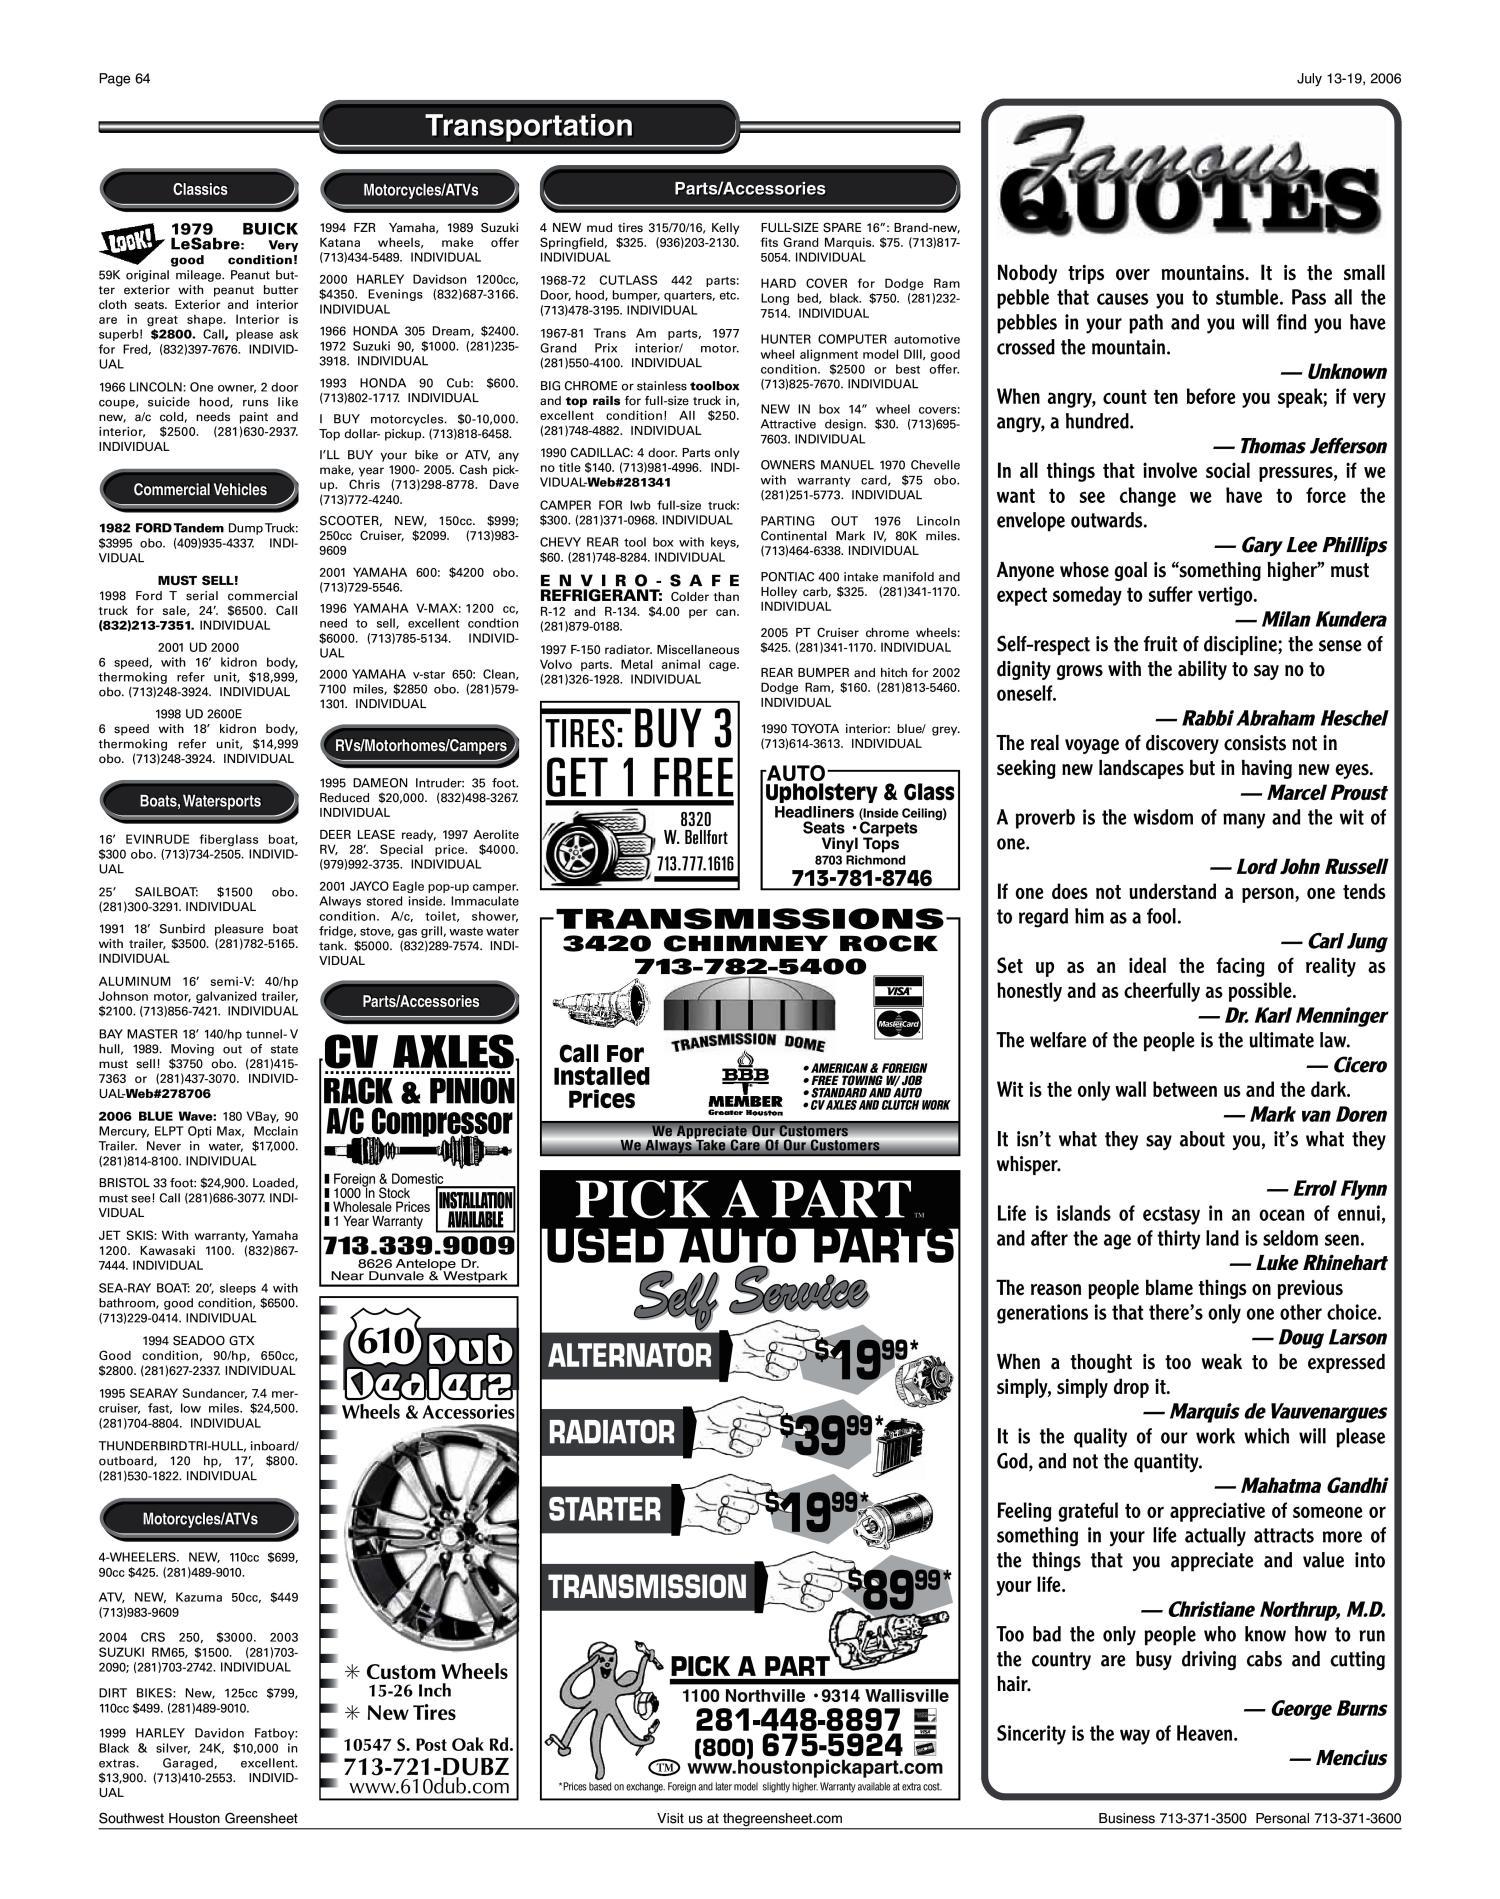 Greensheet (Houston, Tex ), Vol  37, No  272, Ed  1 Thursday, July